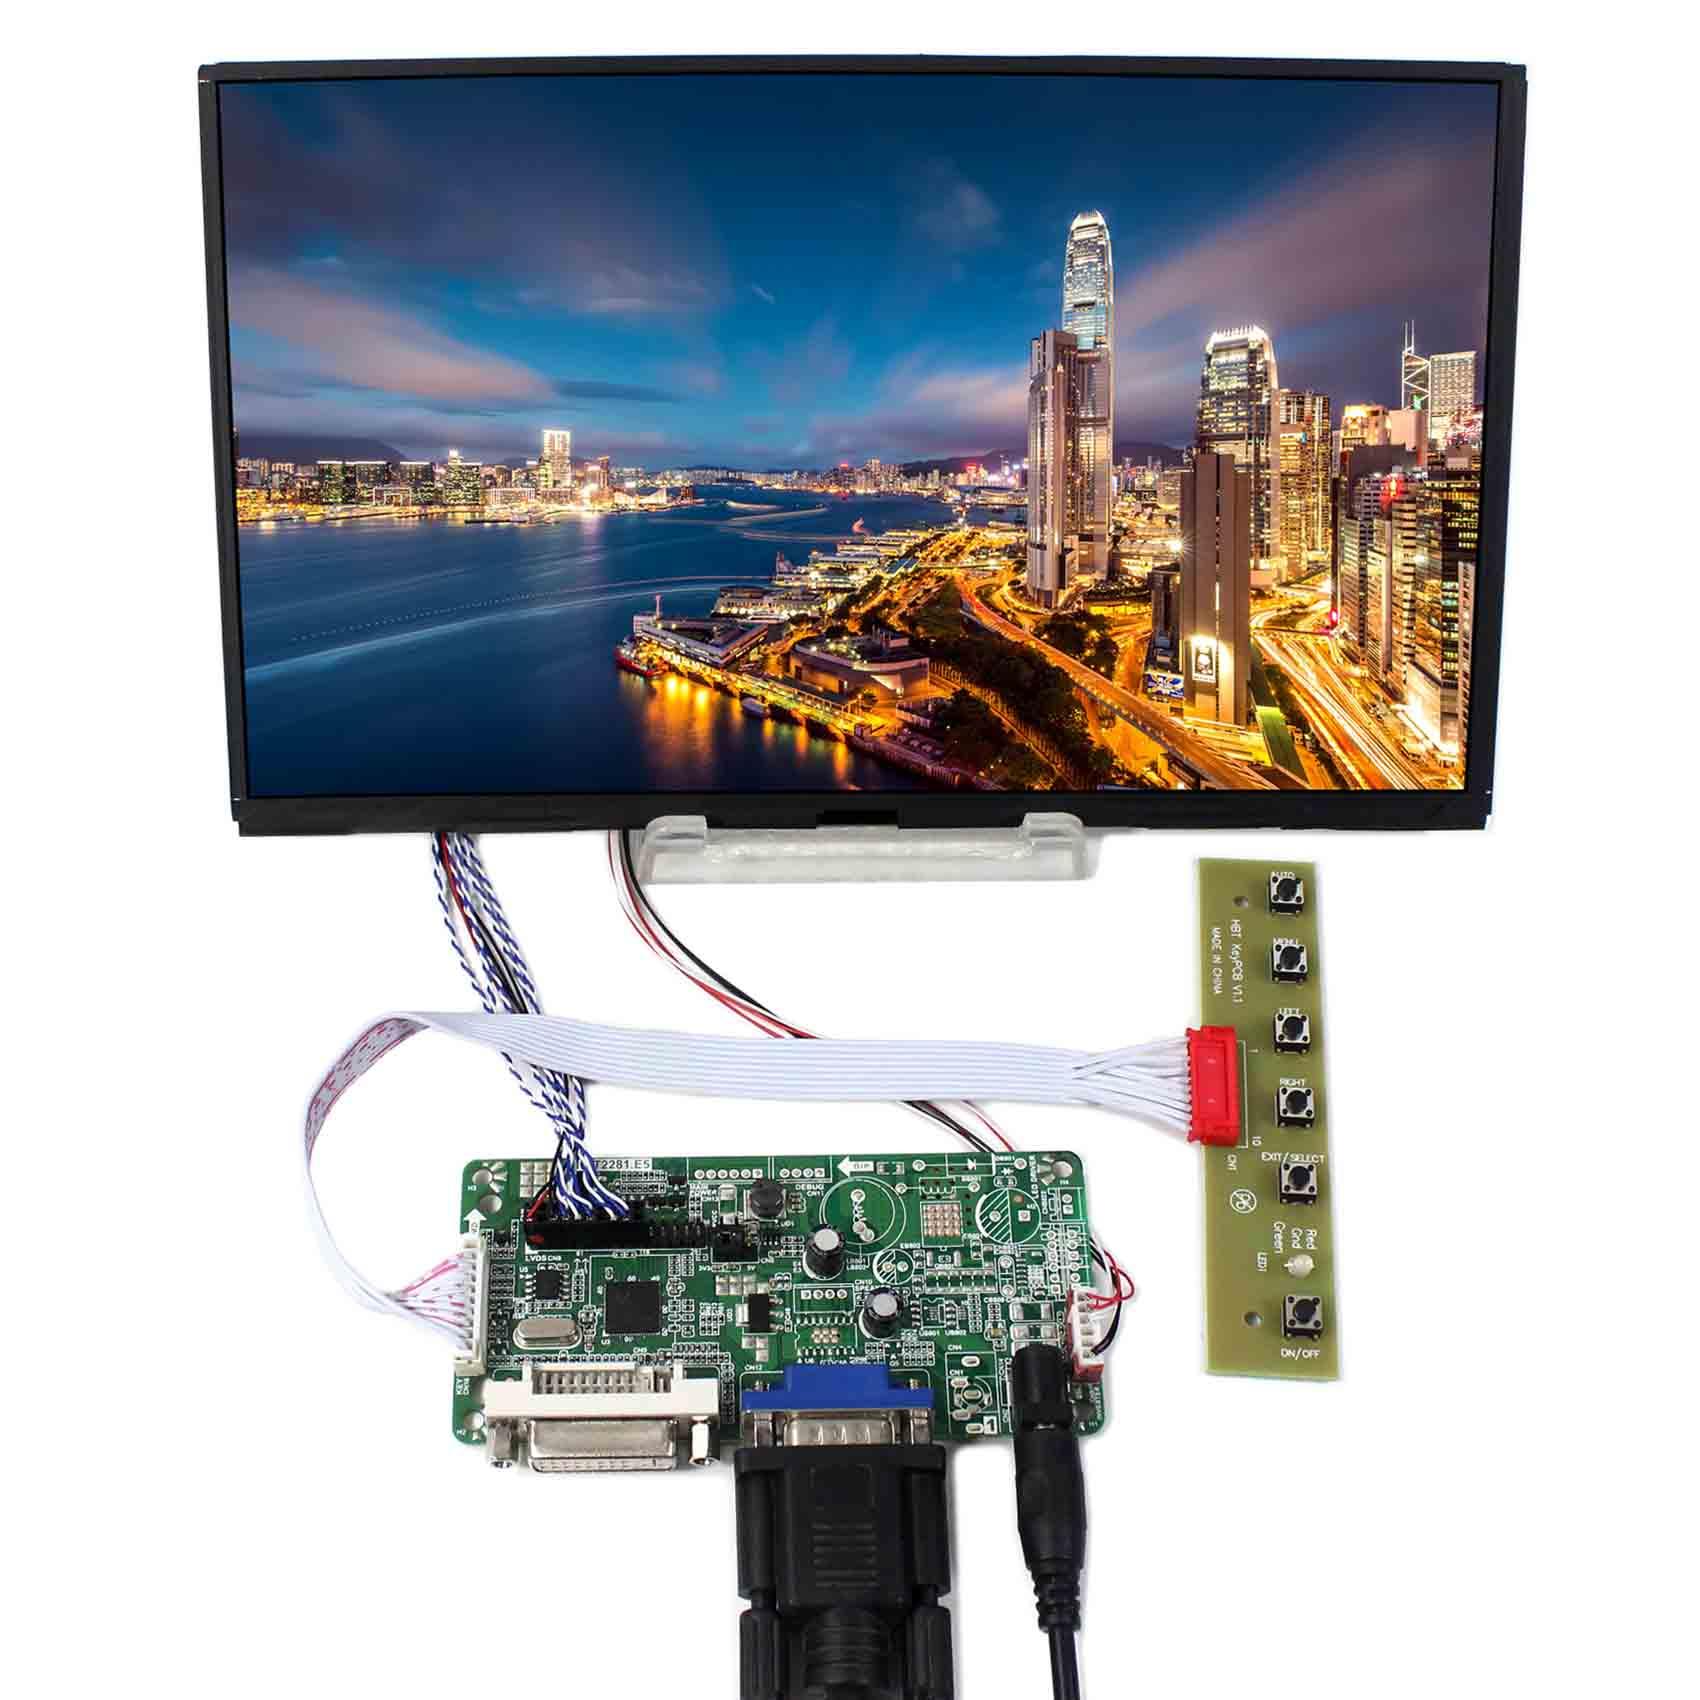 DVI VGA LCD Controller Board With 10.1inch 1366x768 B101XAN01 IPS LCD Panel